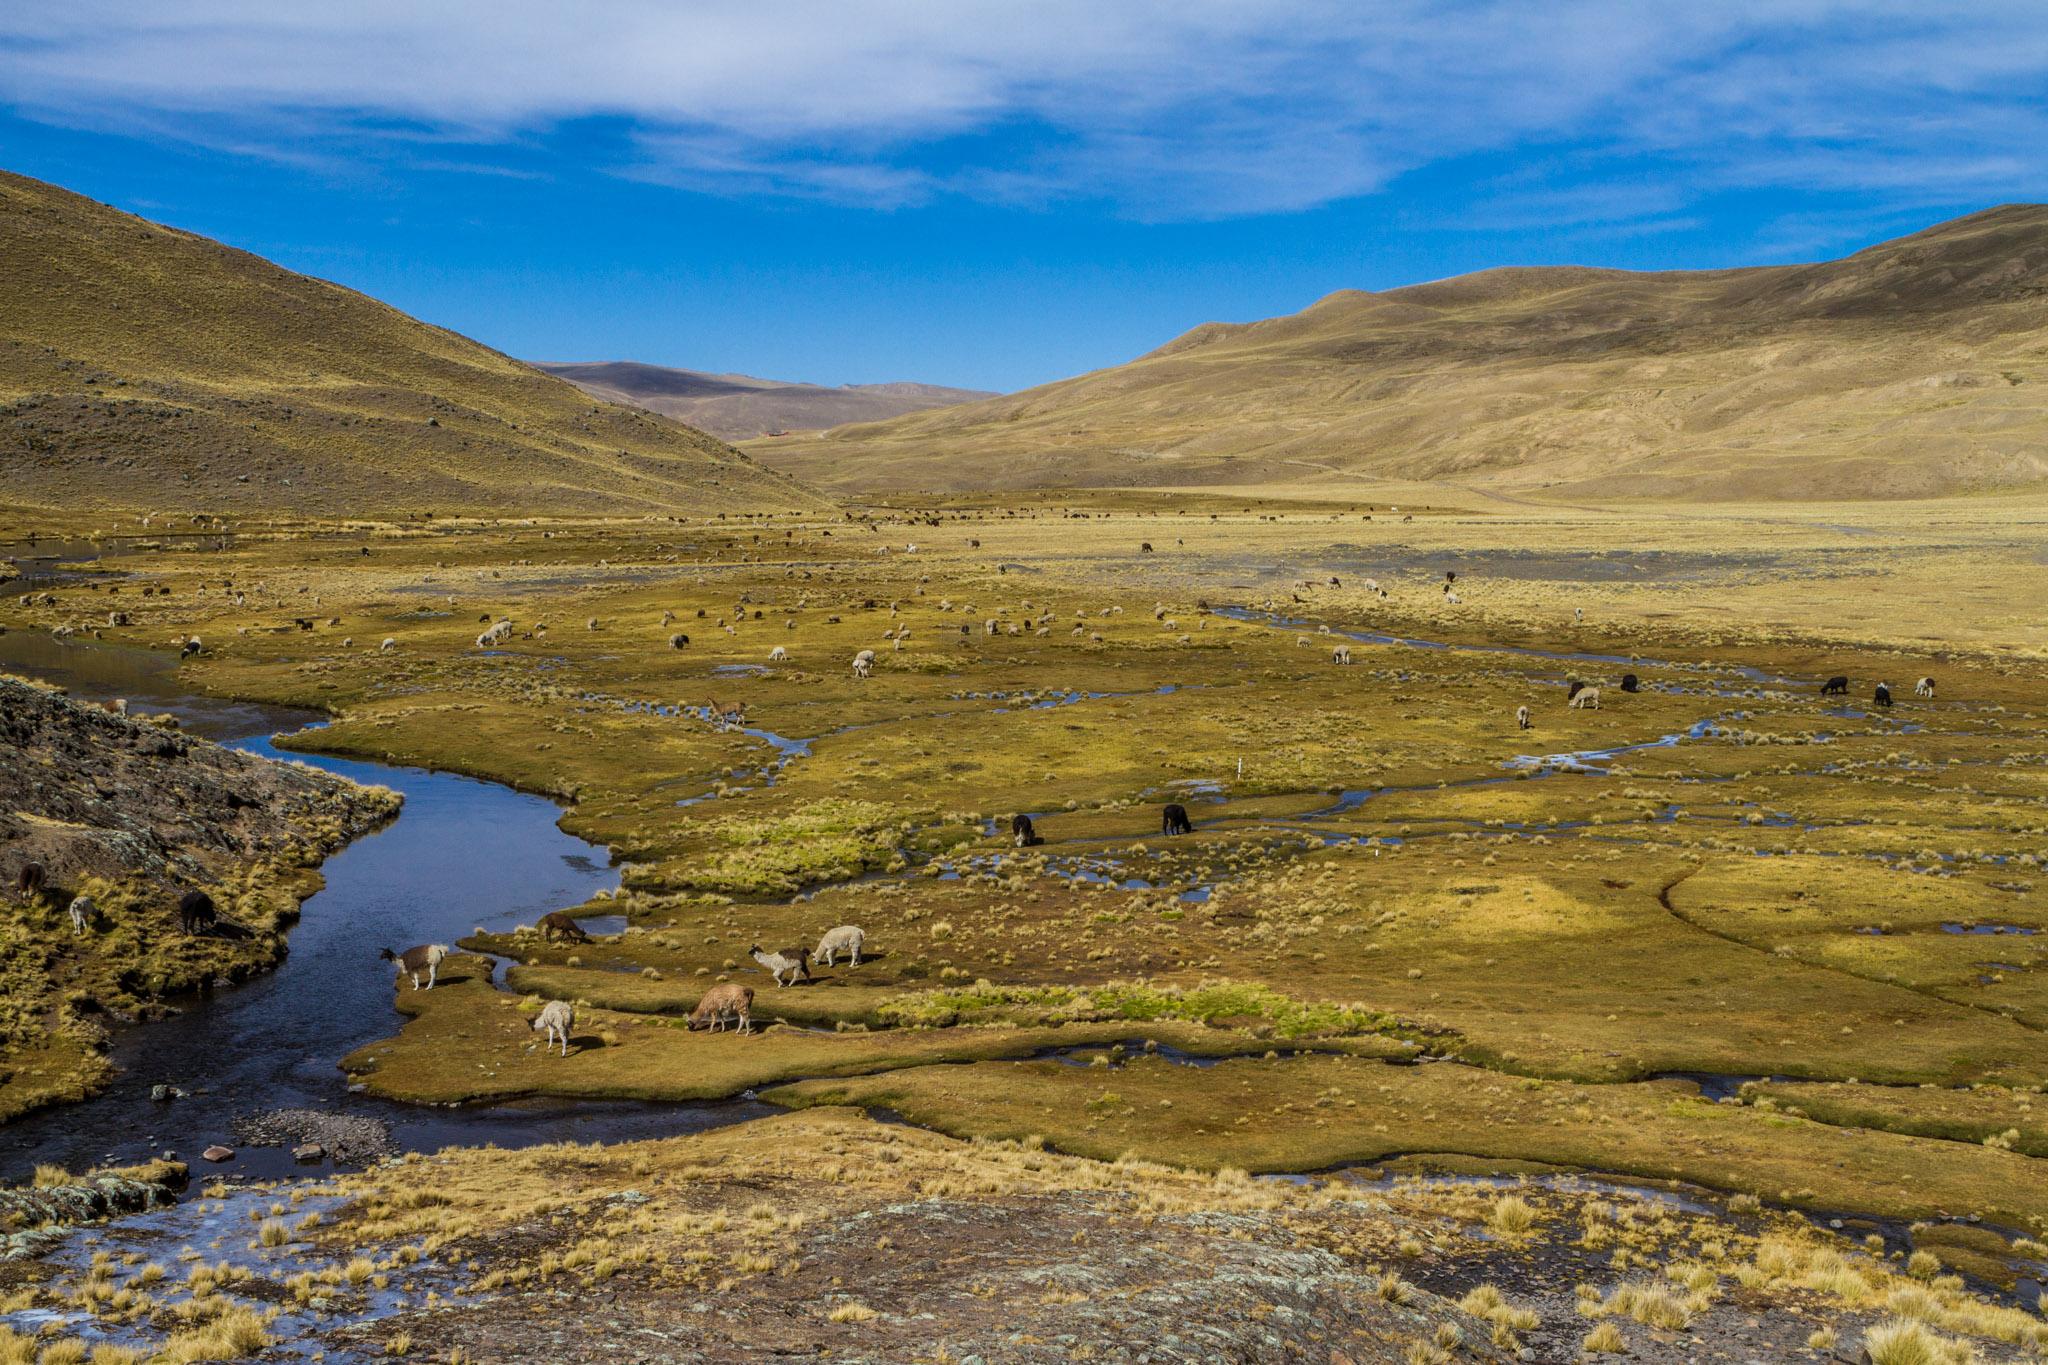 Ali-Barqawi-Studios-Explore-Series-Travel-Adventure-Documentary-C4CGAZA-Bolivia-Mount-Tarija-2015-248.jpg